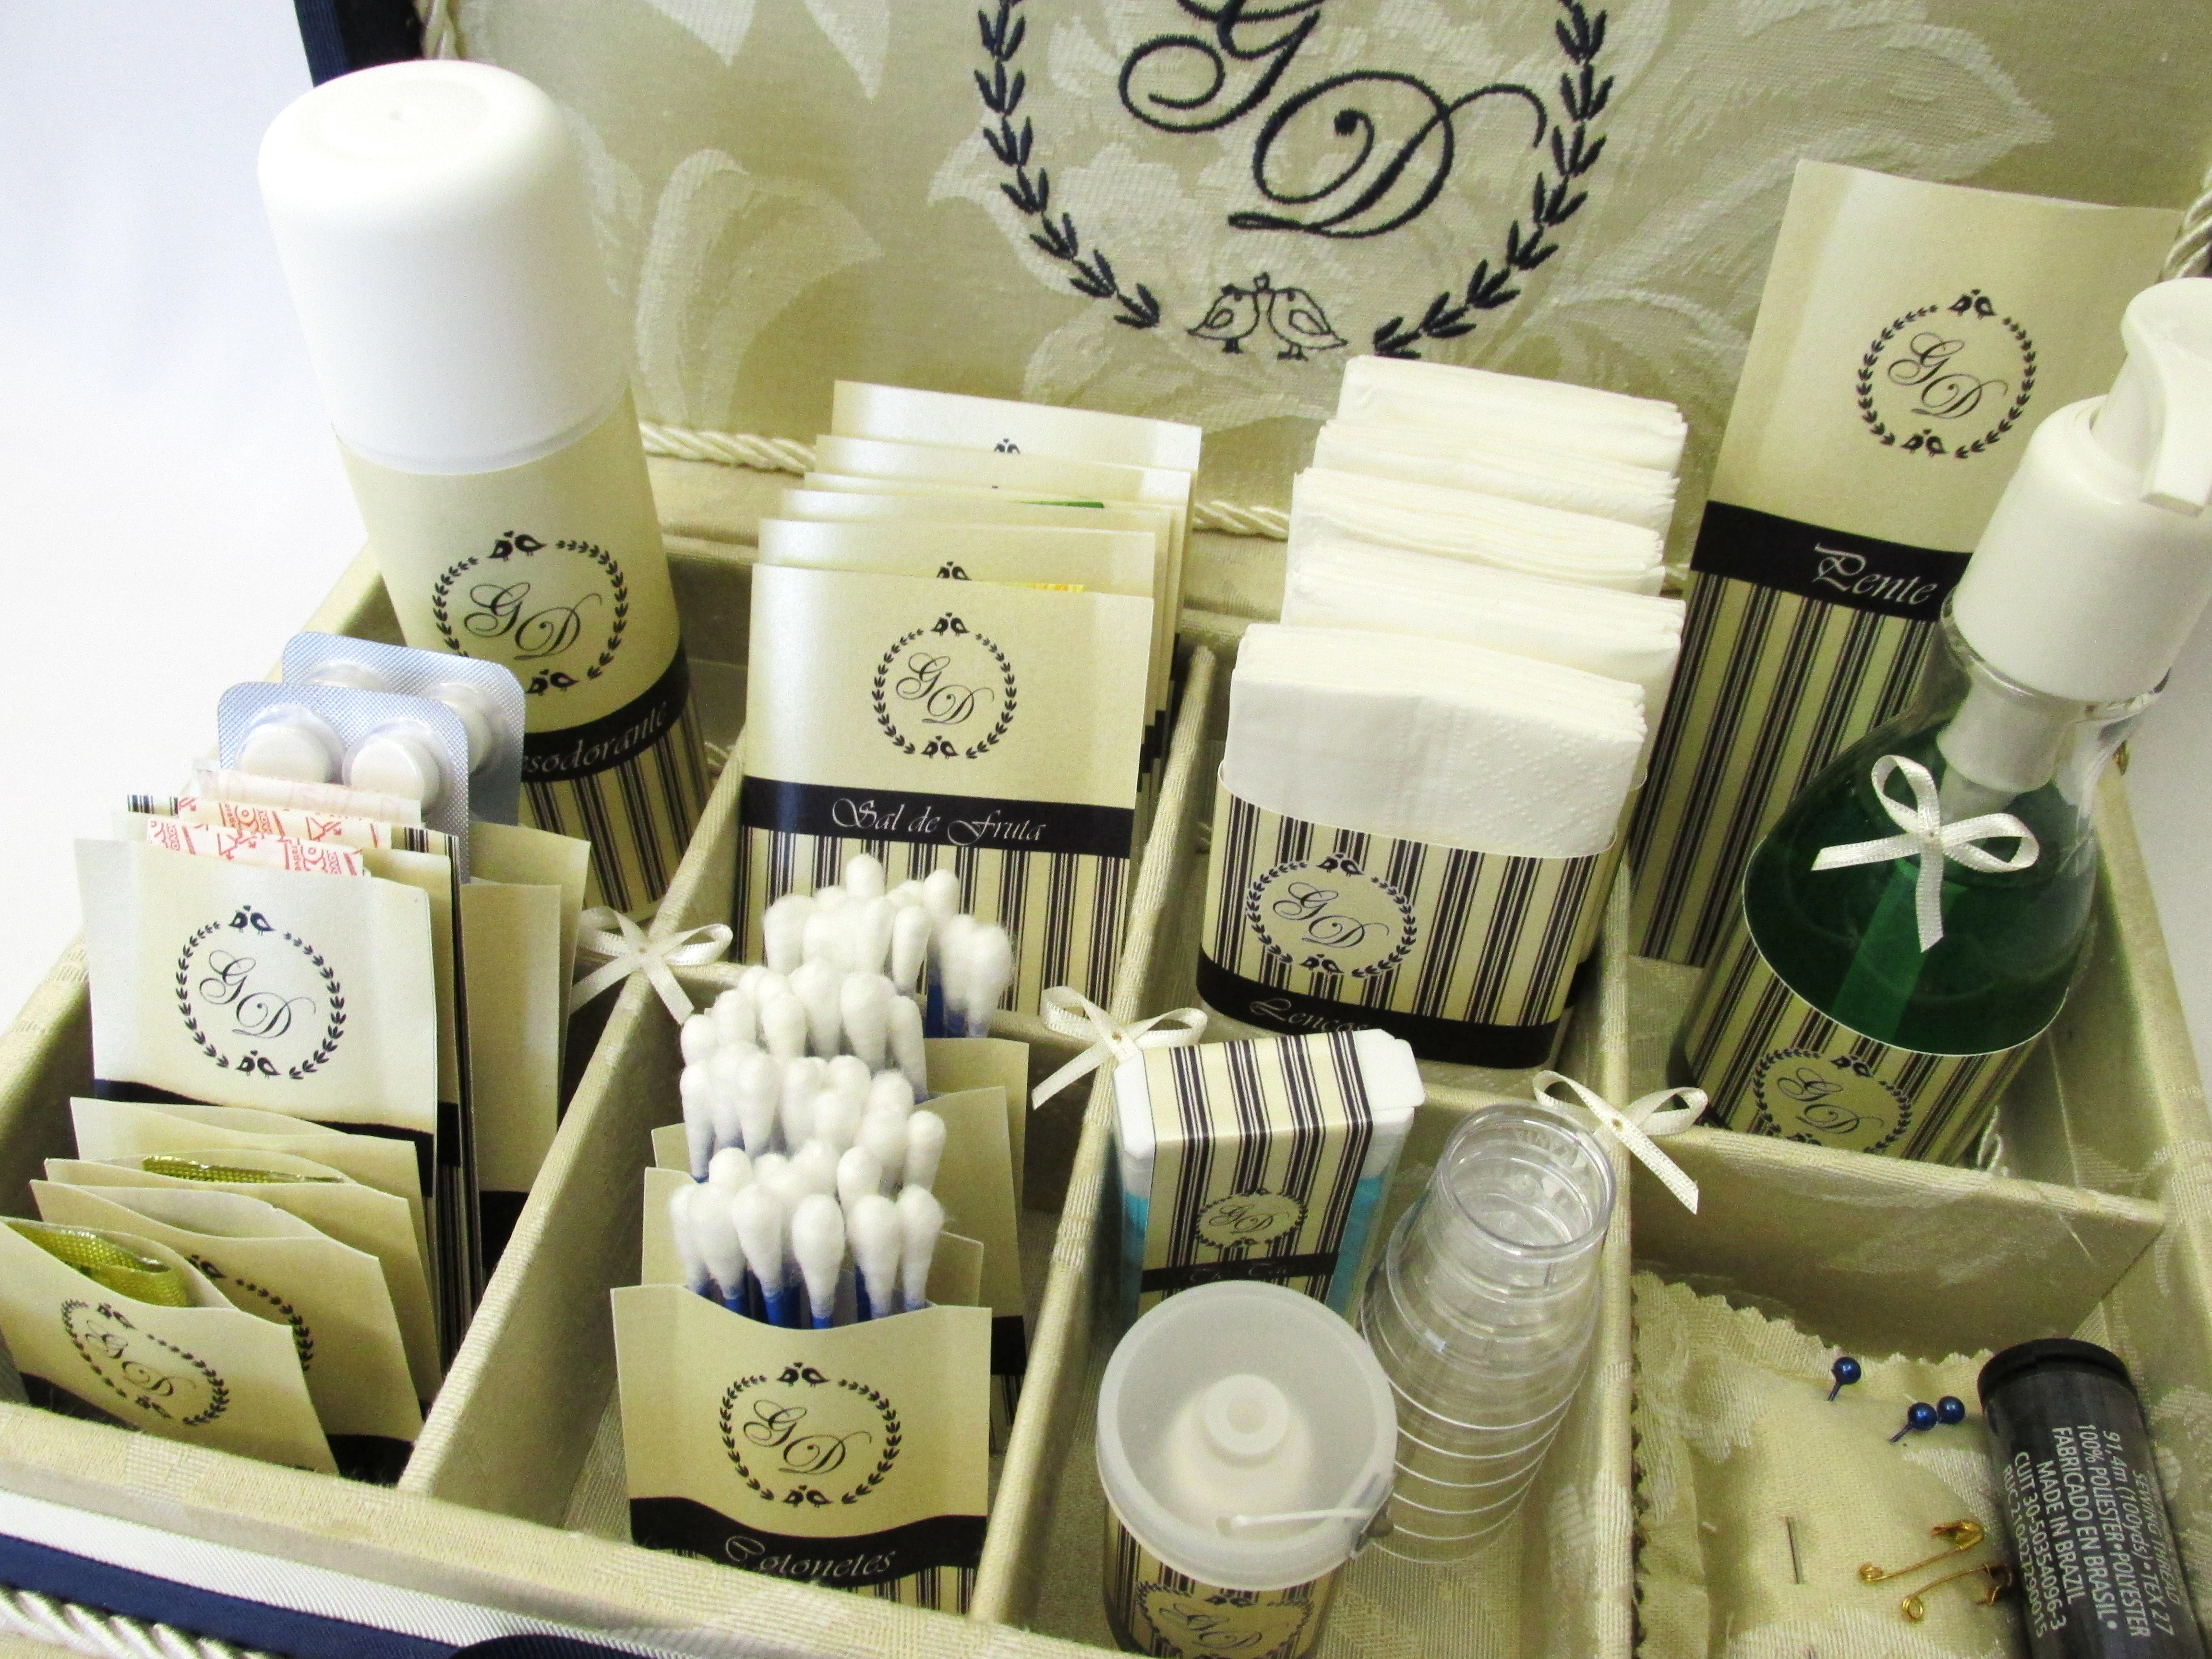 Kit Para Banheiro No Casamento : Caixa kit toalete bordada p casamento divina elo